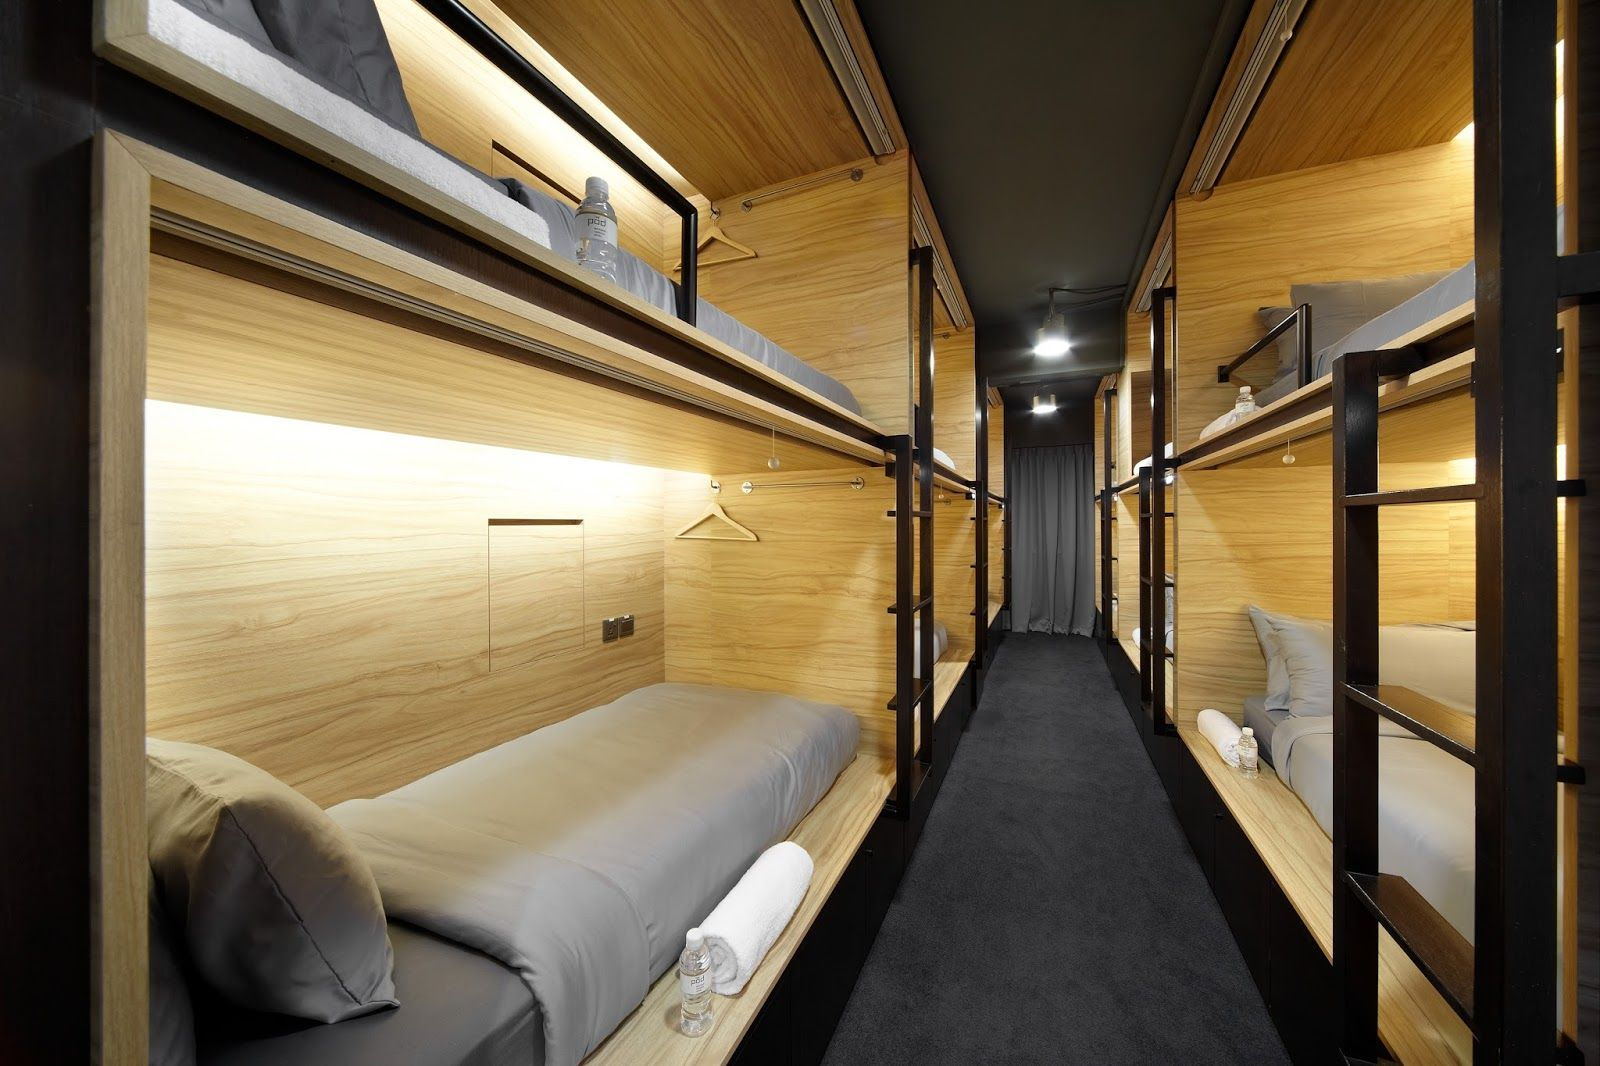 Can a capsule hotel be considered luxury salas de estar for Hostal luxury